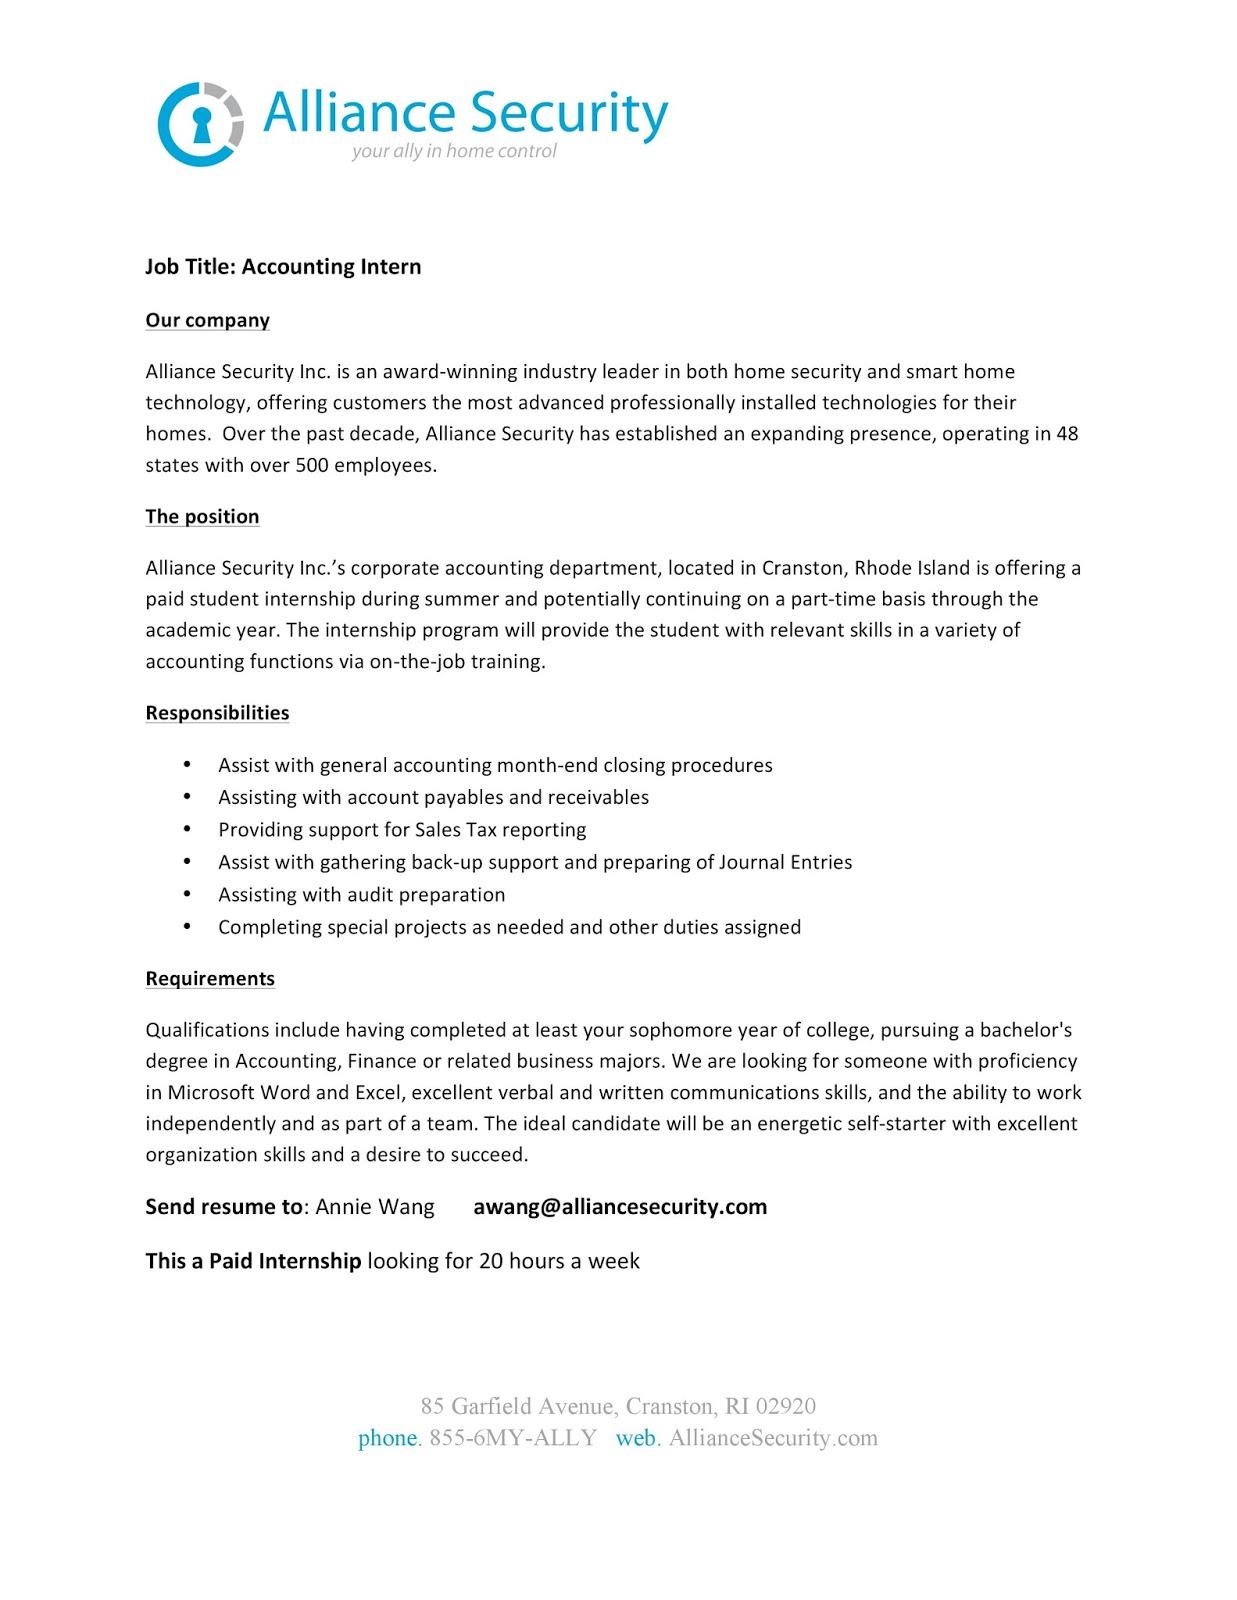 URI CBA Internship/Job Information: Alliance Security - Accounting ...